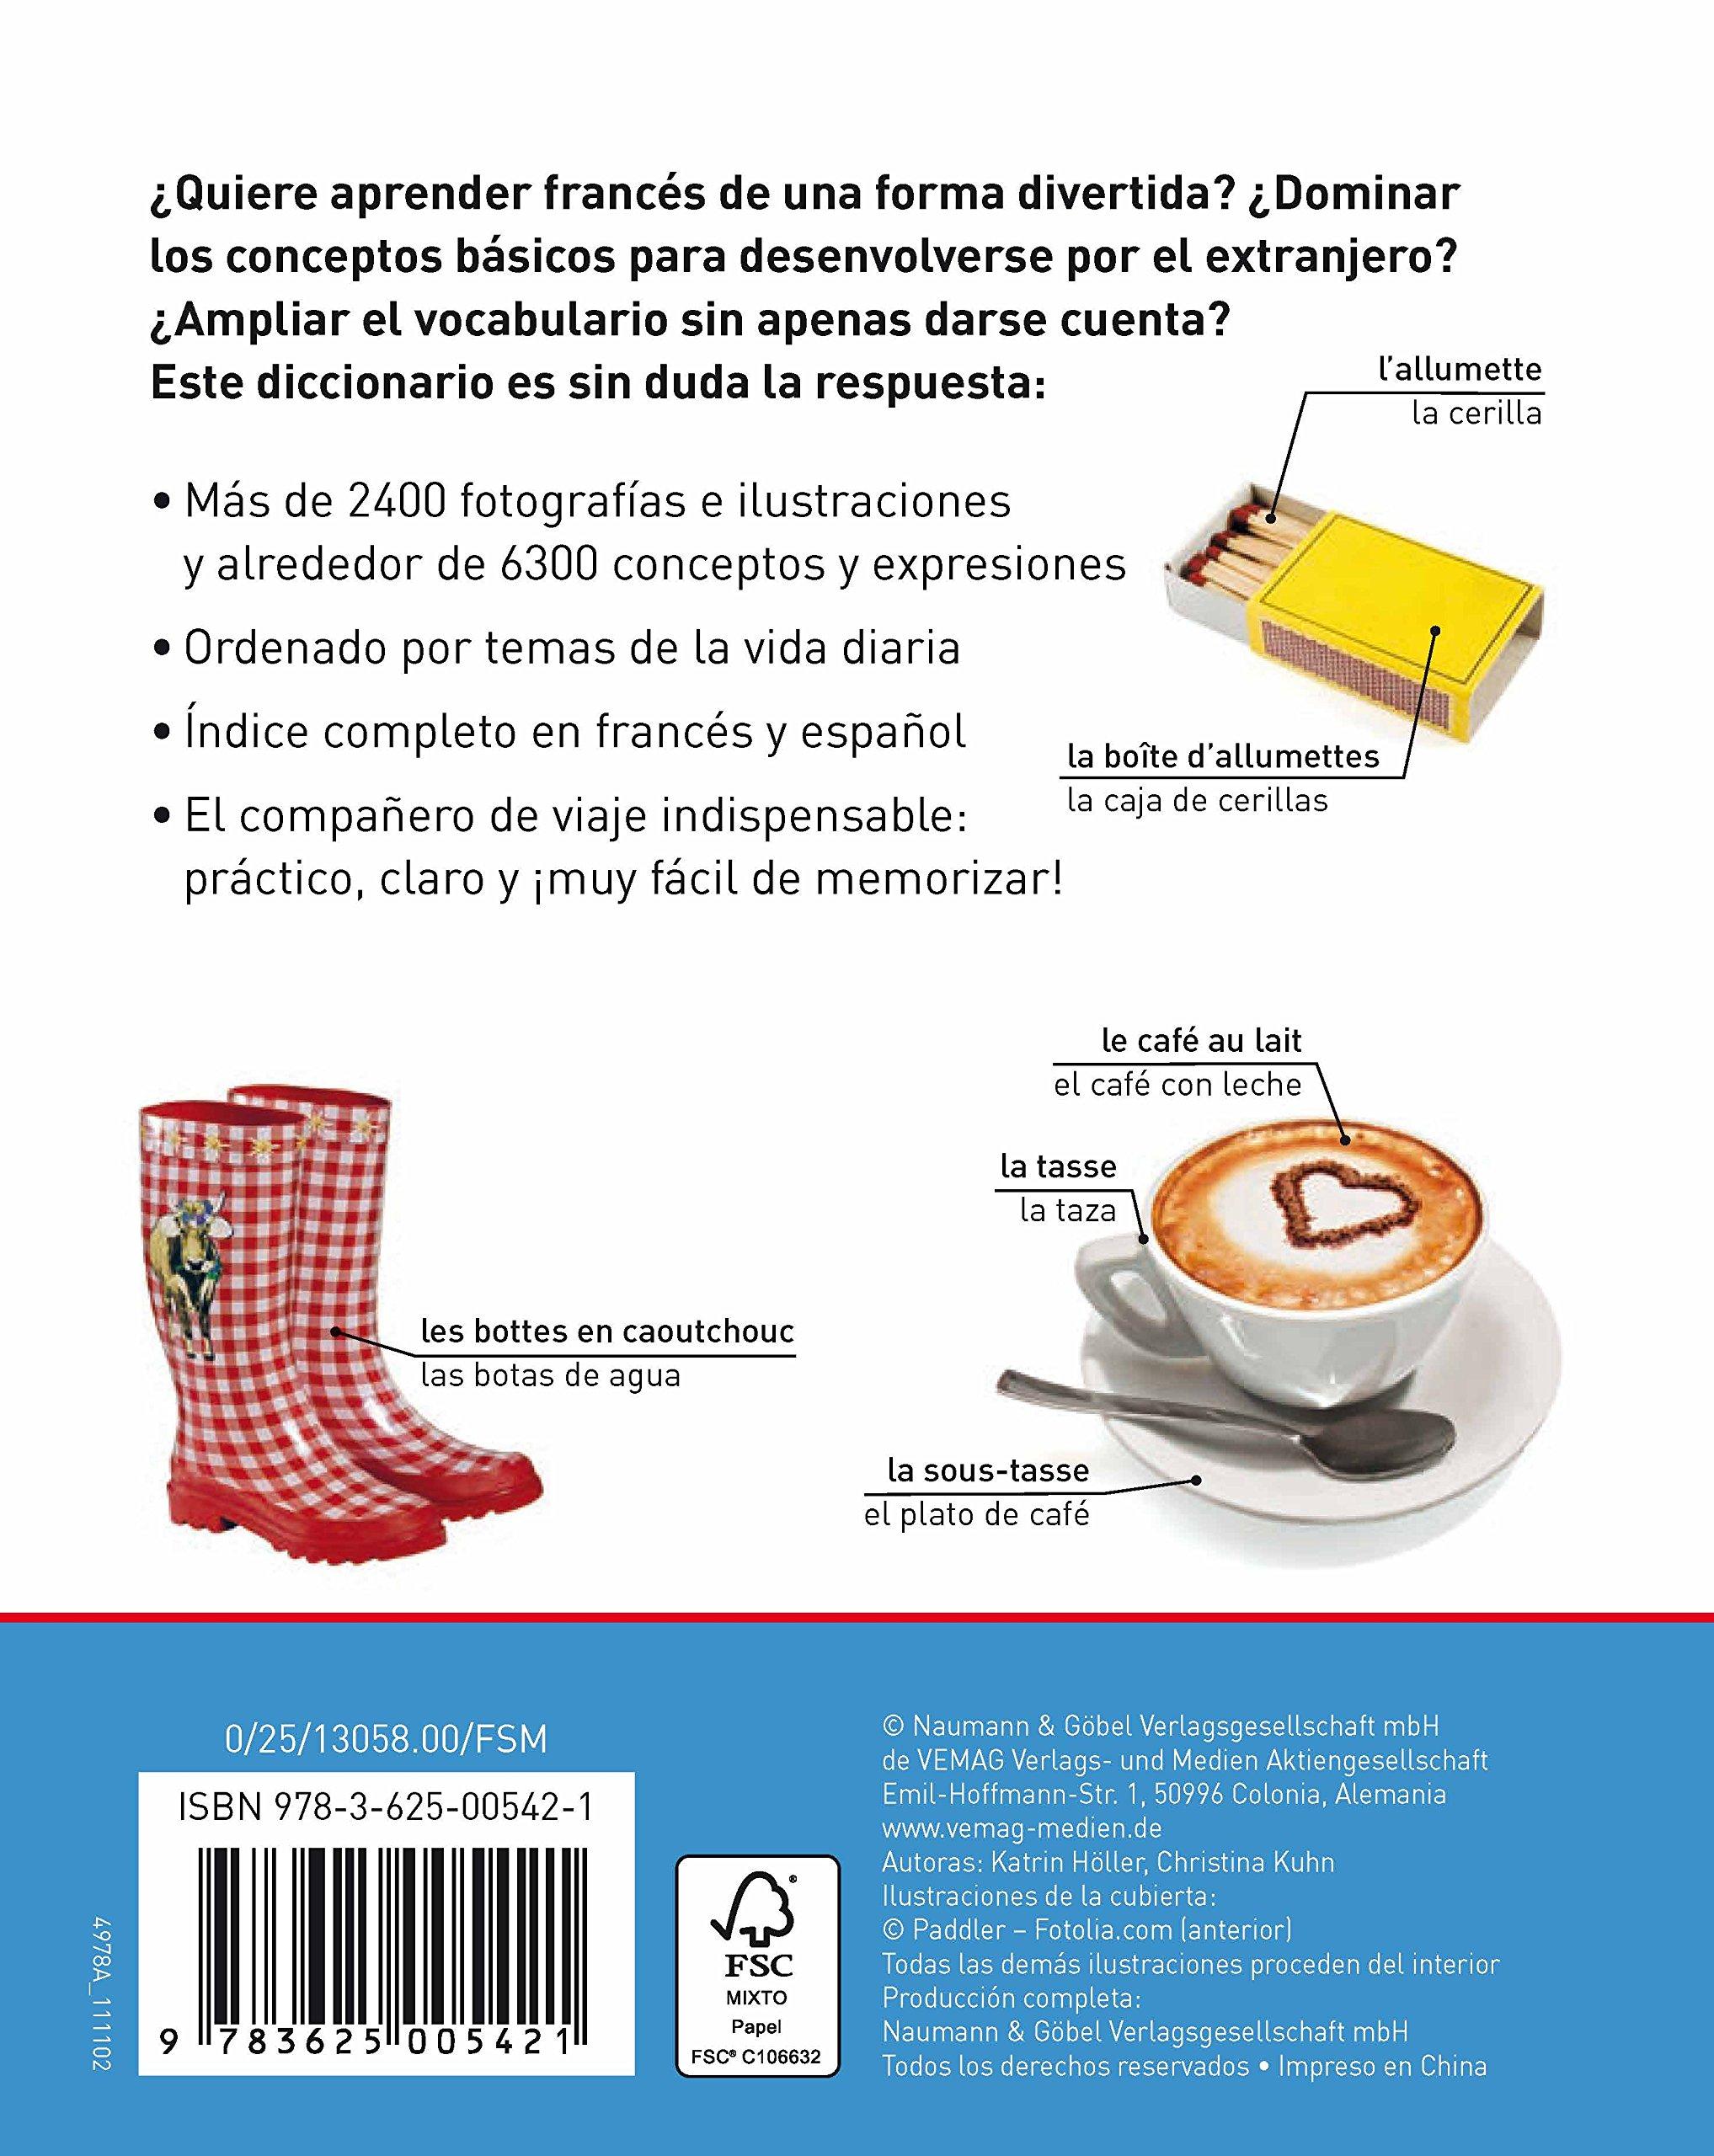 Diccionario Visual Francés-Español: Katrin Hóller: 9783625005421: Amazon.com: Books